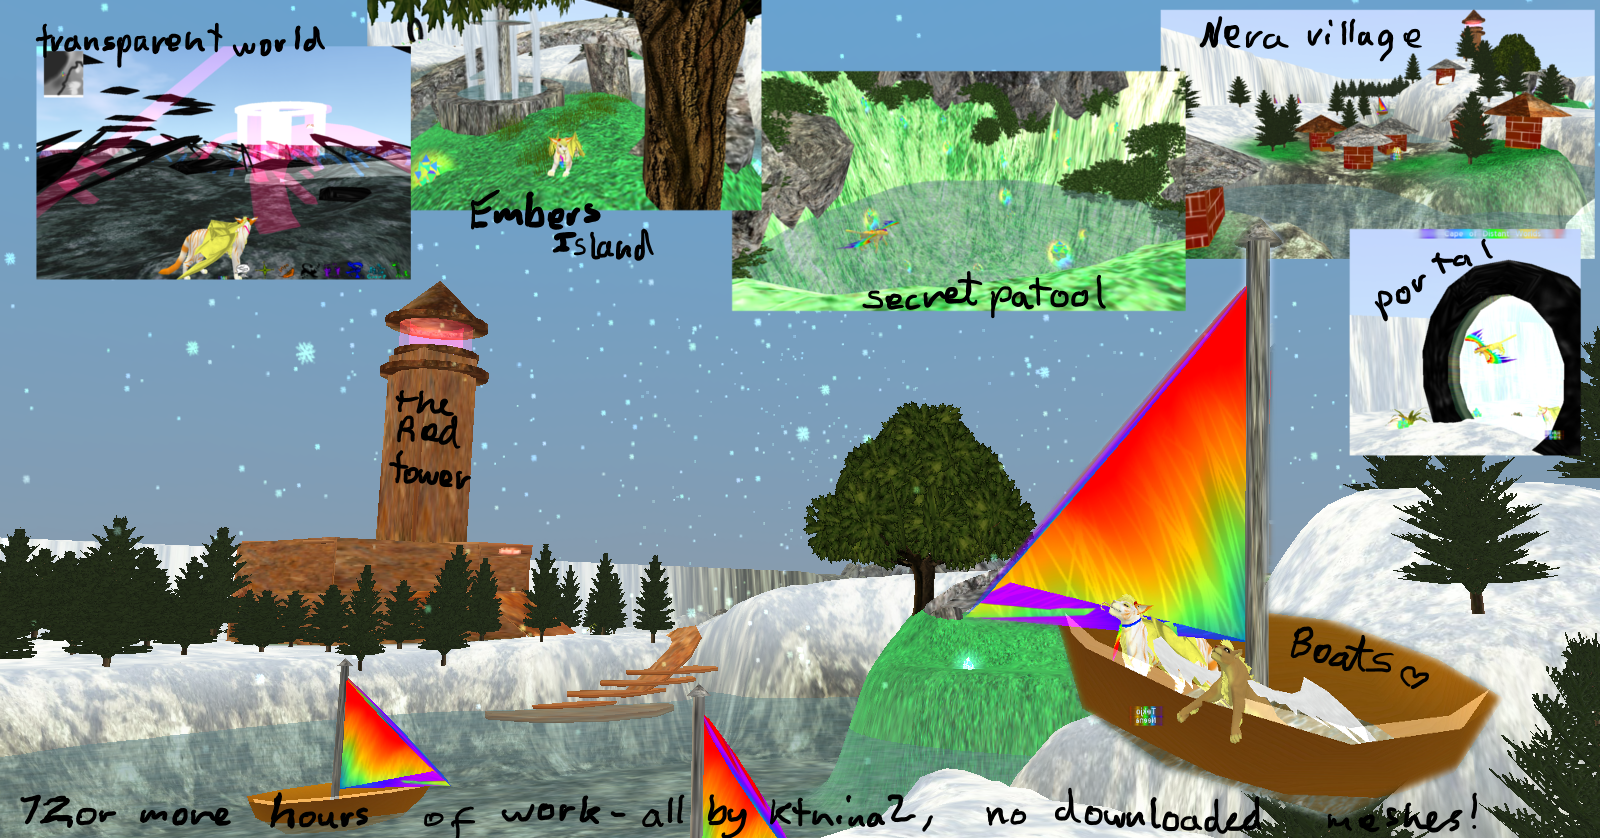 Noreturn Transparentworld Feralheart Maps Download By Nin Kaii On Deviantart